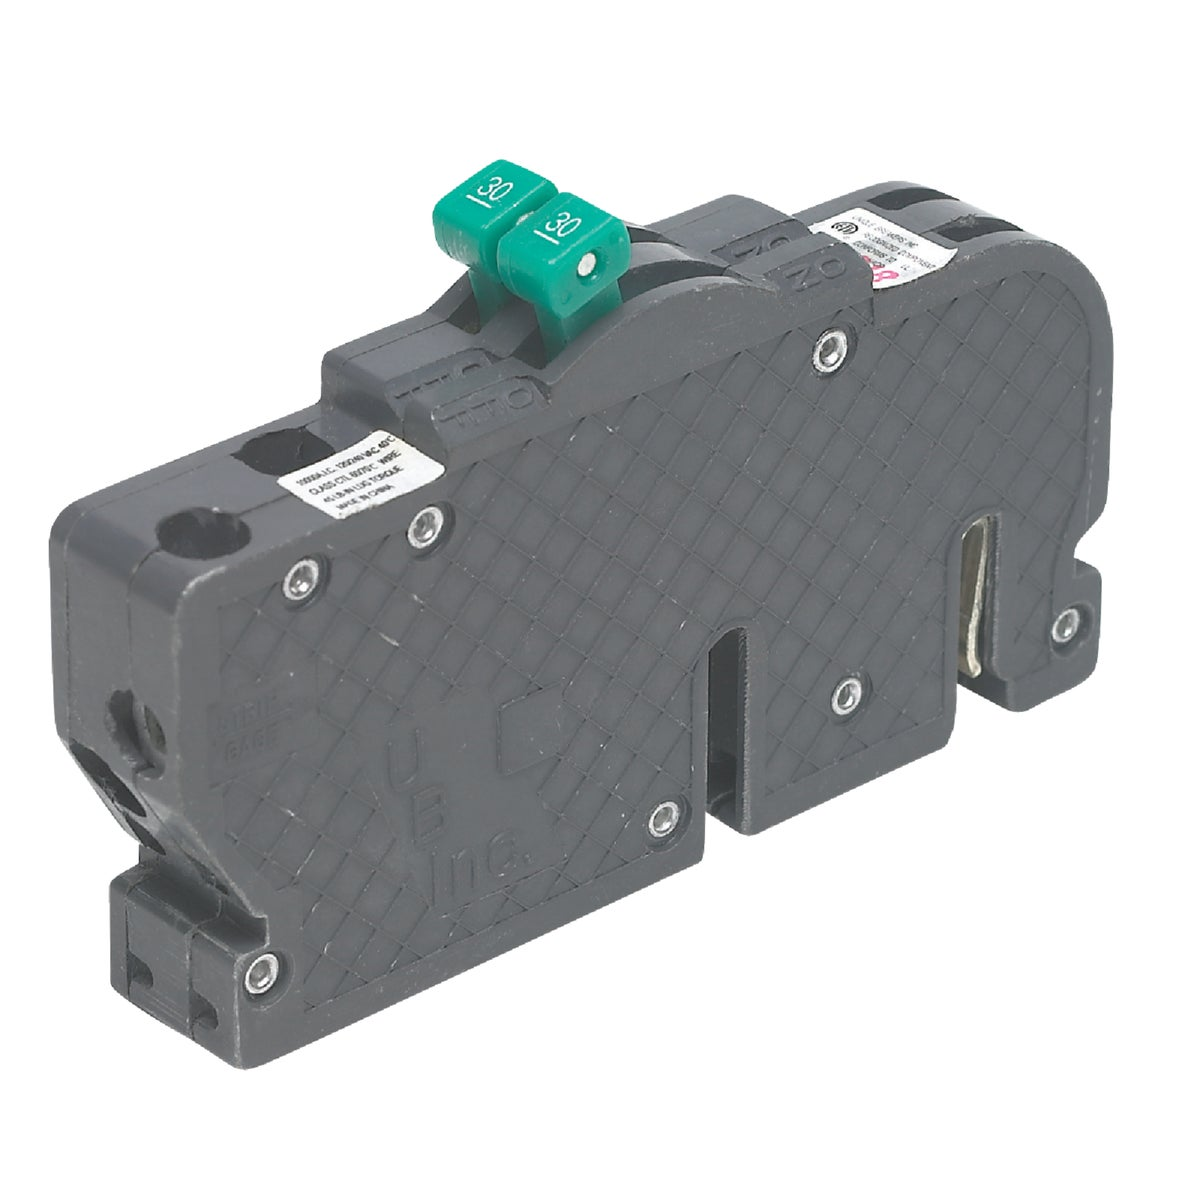 50A 2P Circuit Breaker